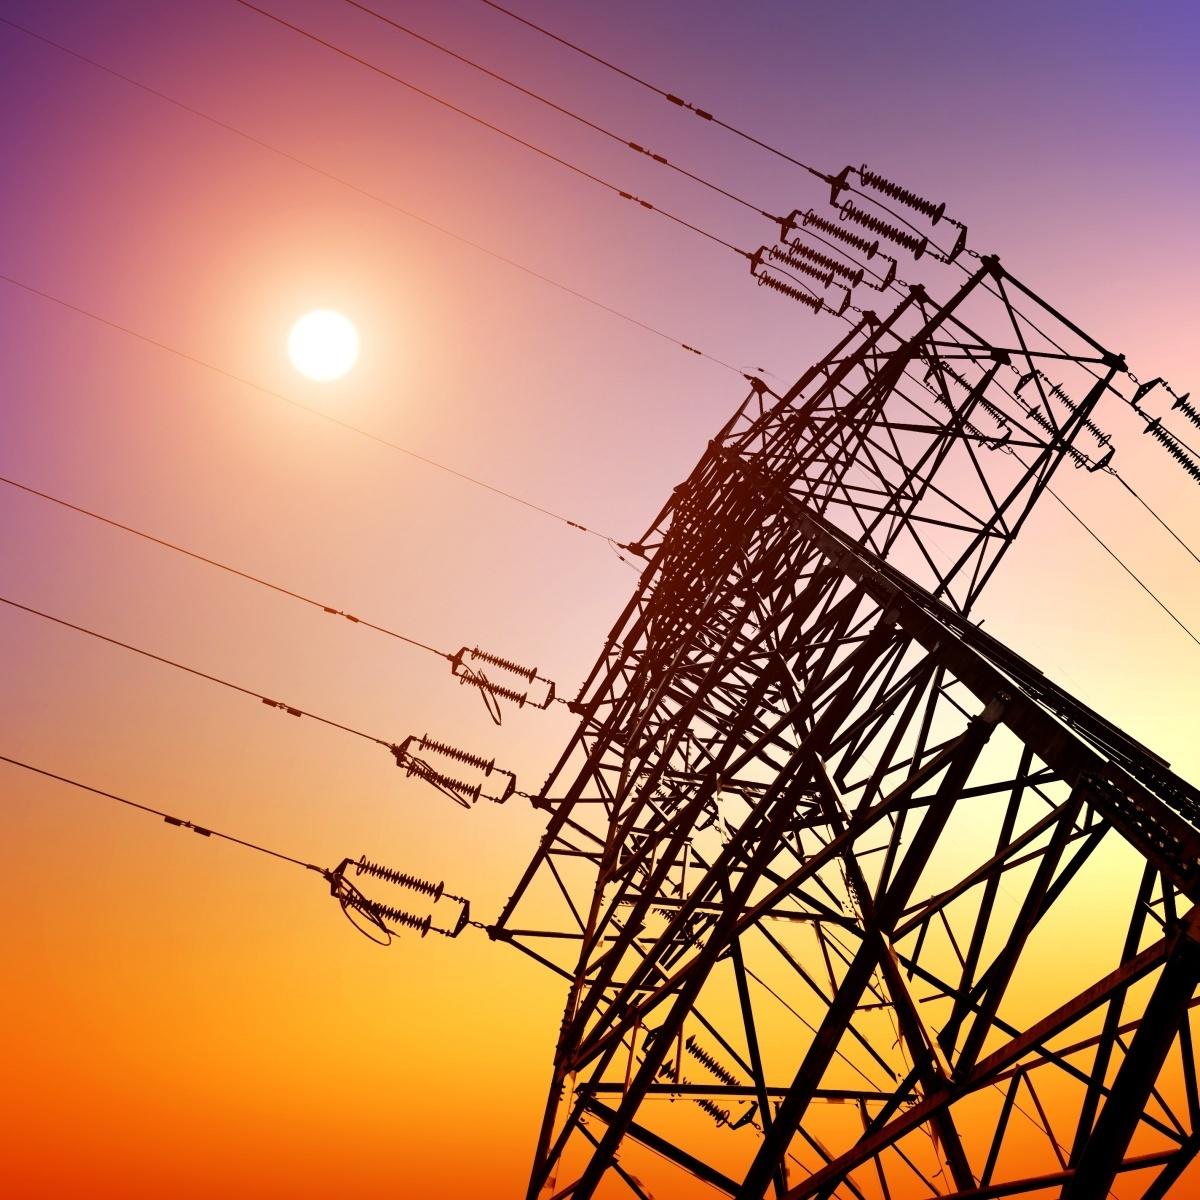 Столб электропередачи — Power pole